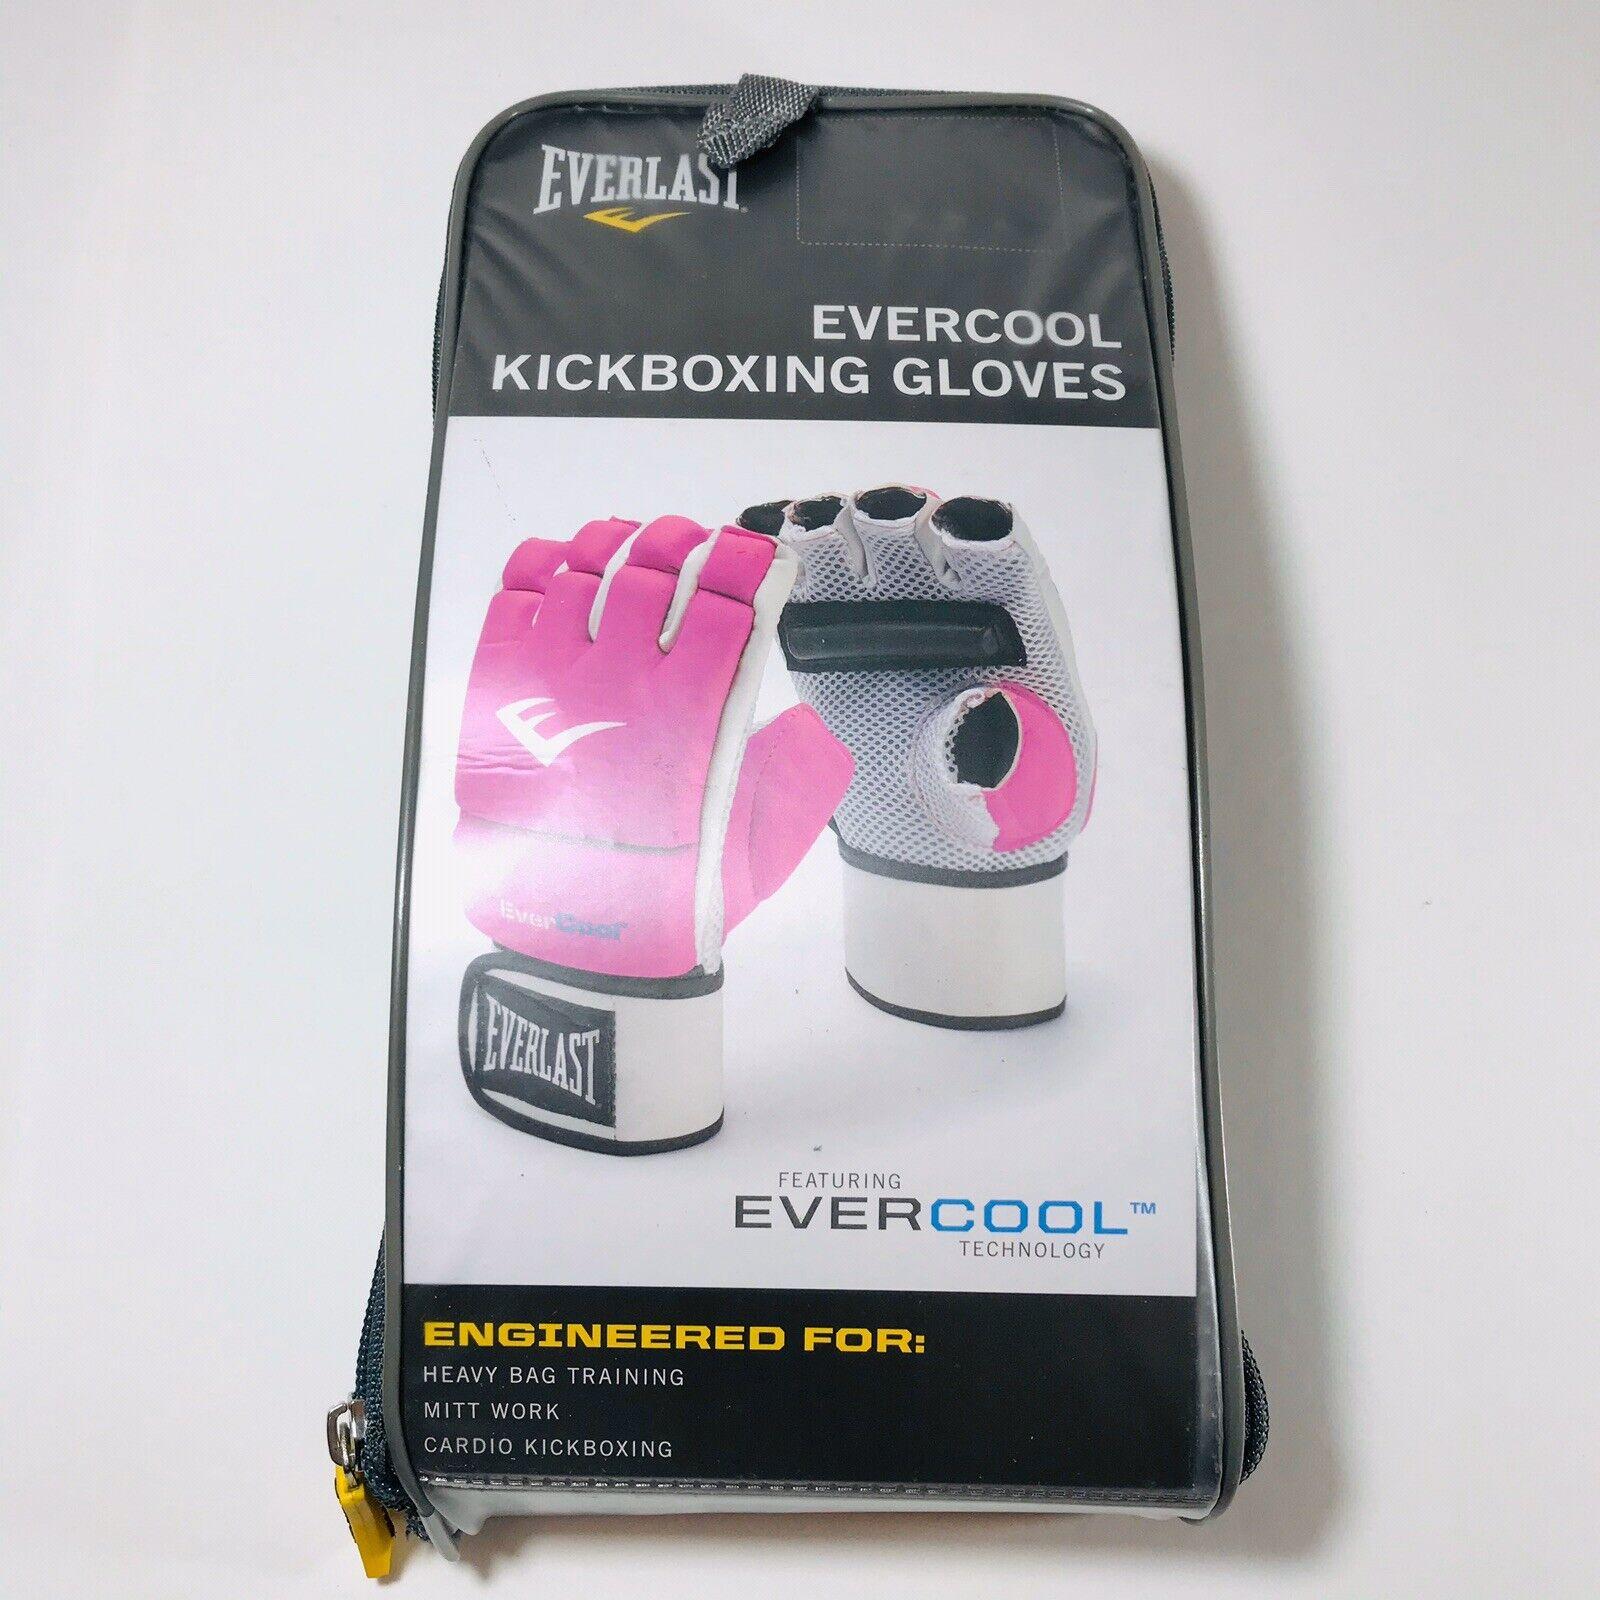 Everlast EverCool Women/'s Kickboxing//heavy bag Gloves pink 4 Oz one size